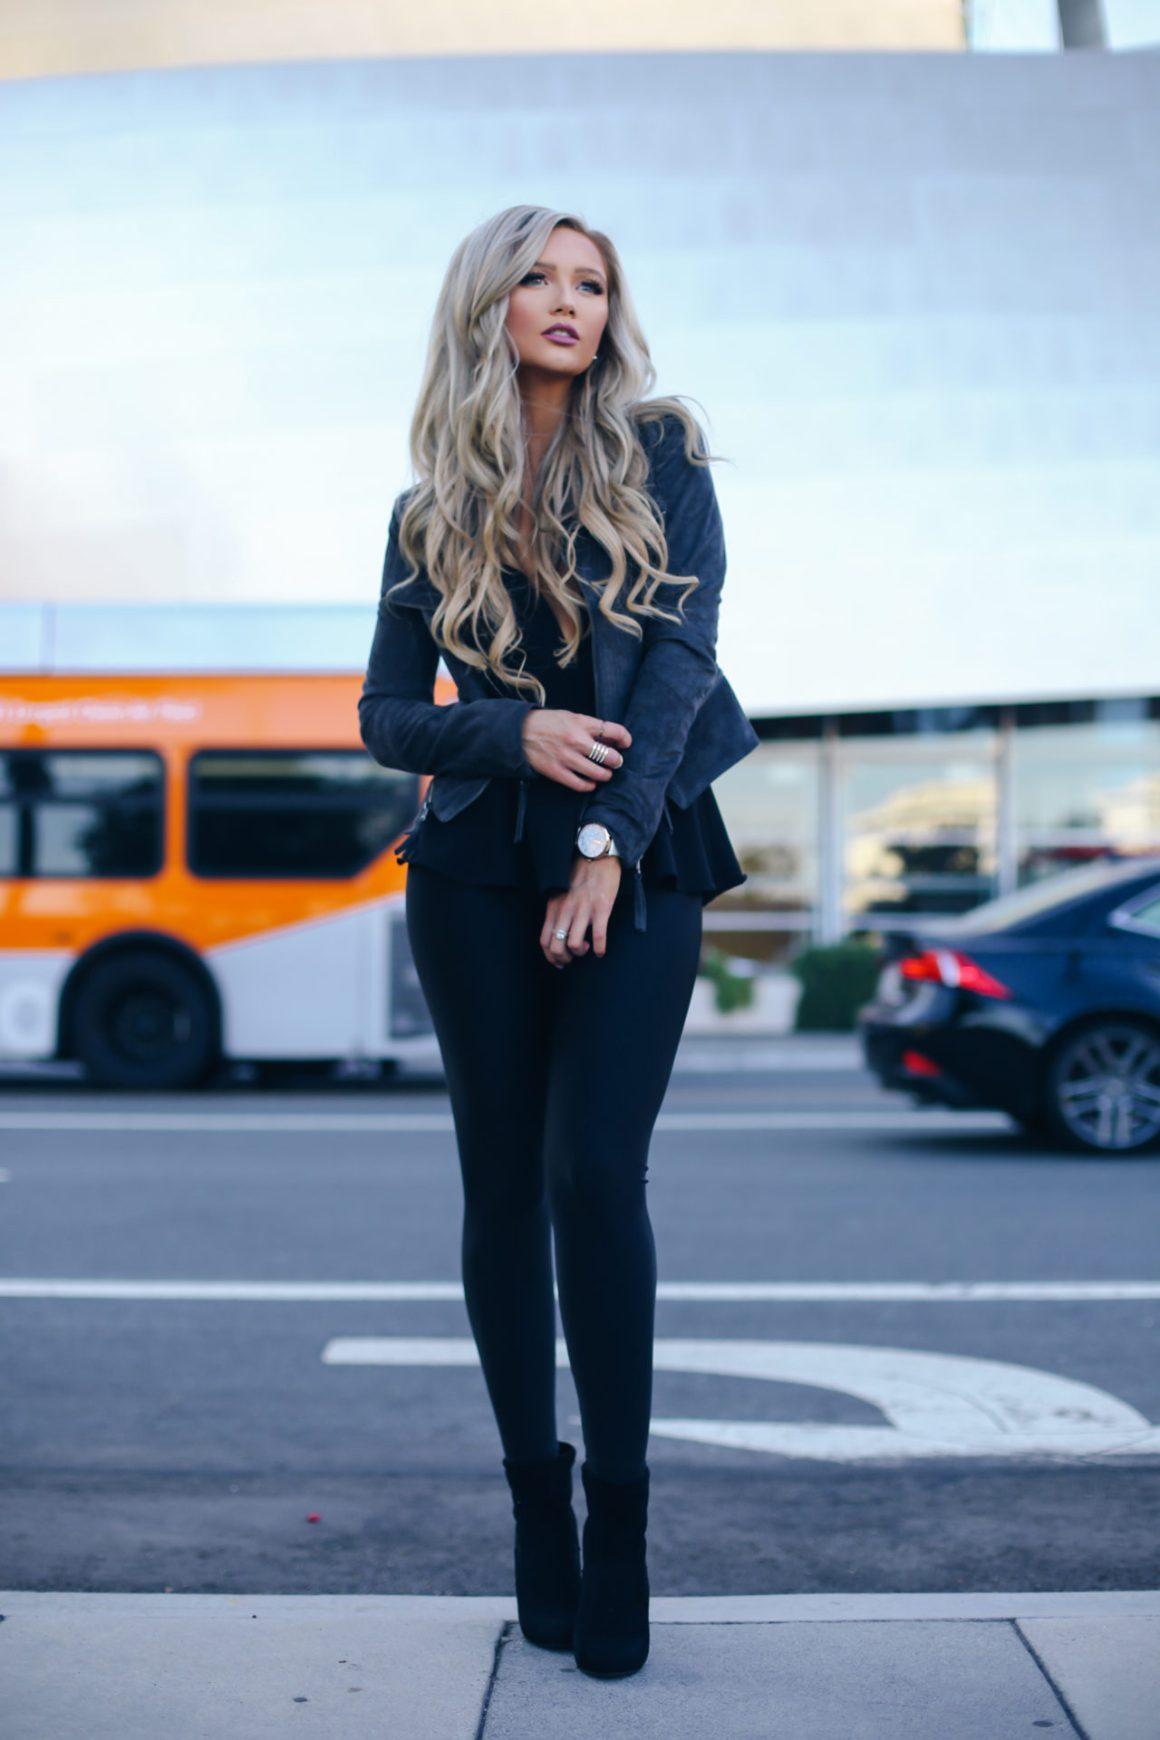 Black-Peplum-leggings-stephanie-danielle-thecityblonde-ryanbyryanchua-4509